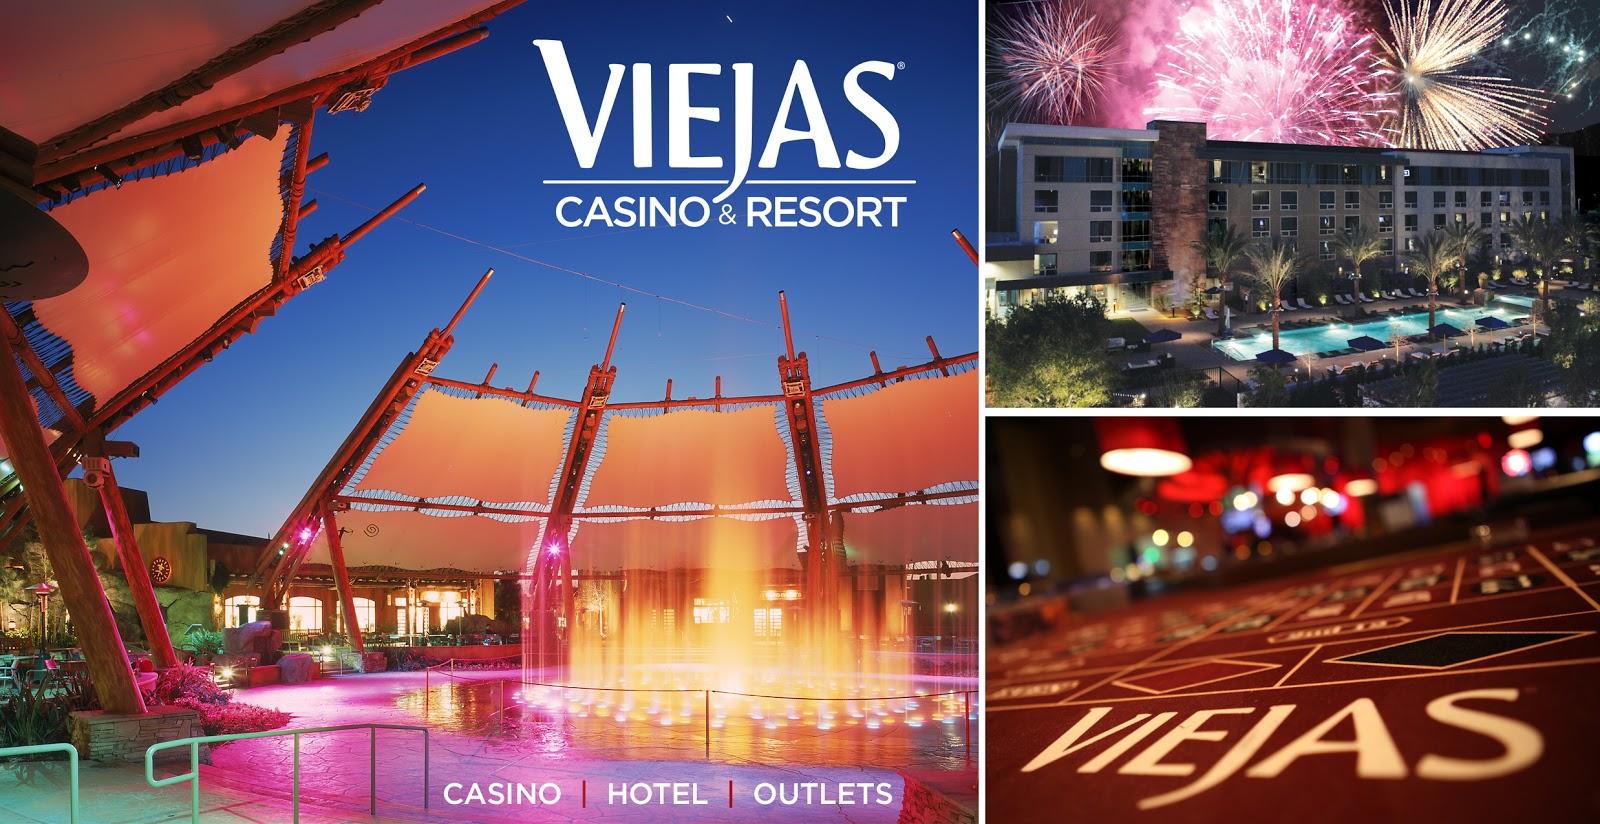 Viejas casino buffet coupon